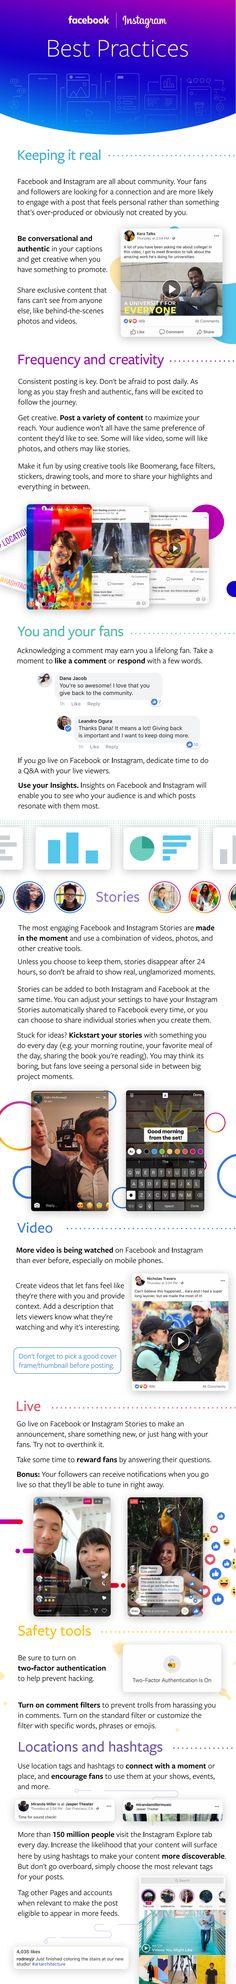 965 best Instagram Marketing images on Pinterest | App design ...